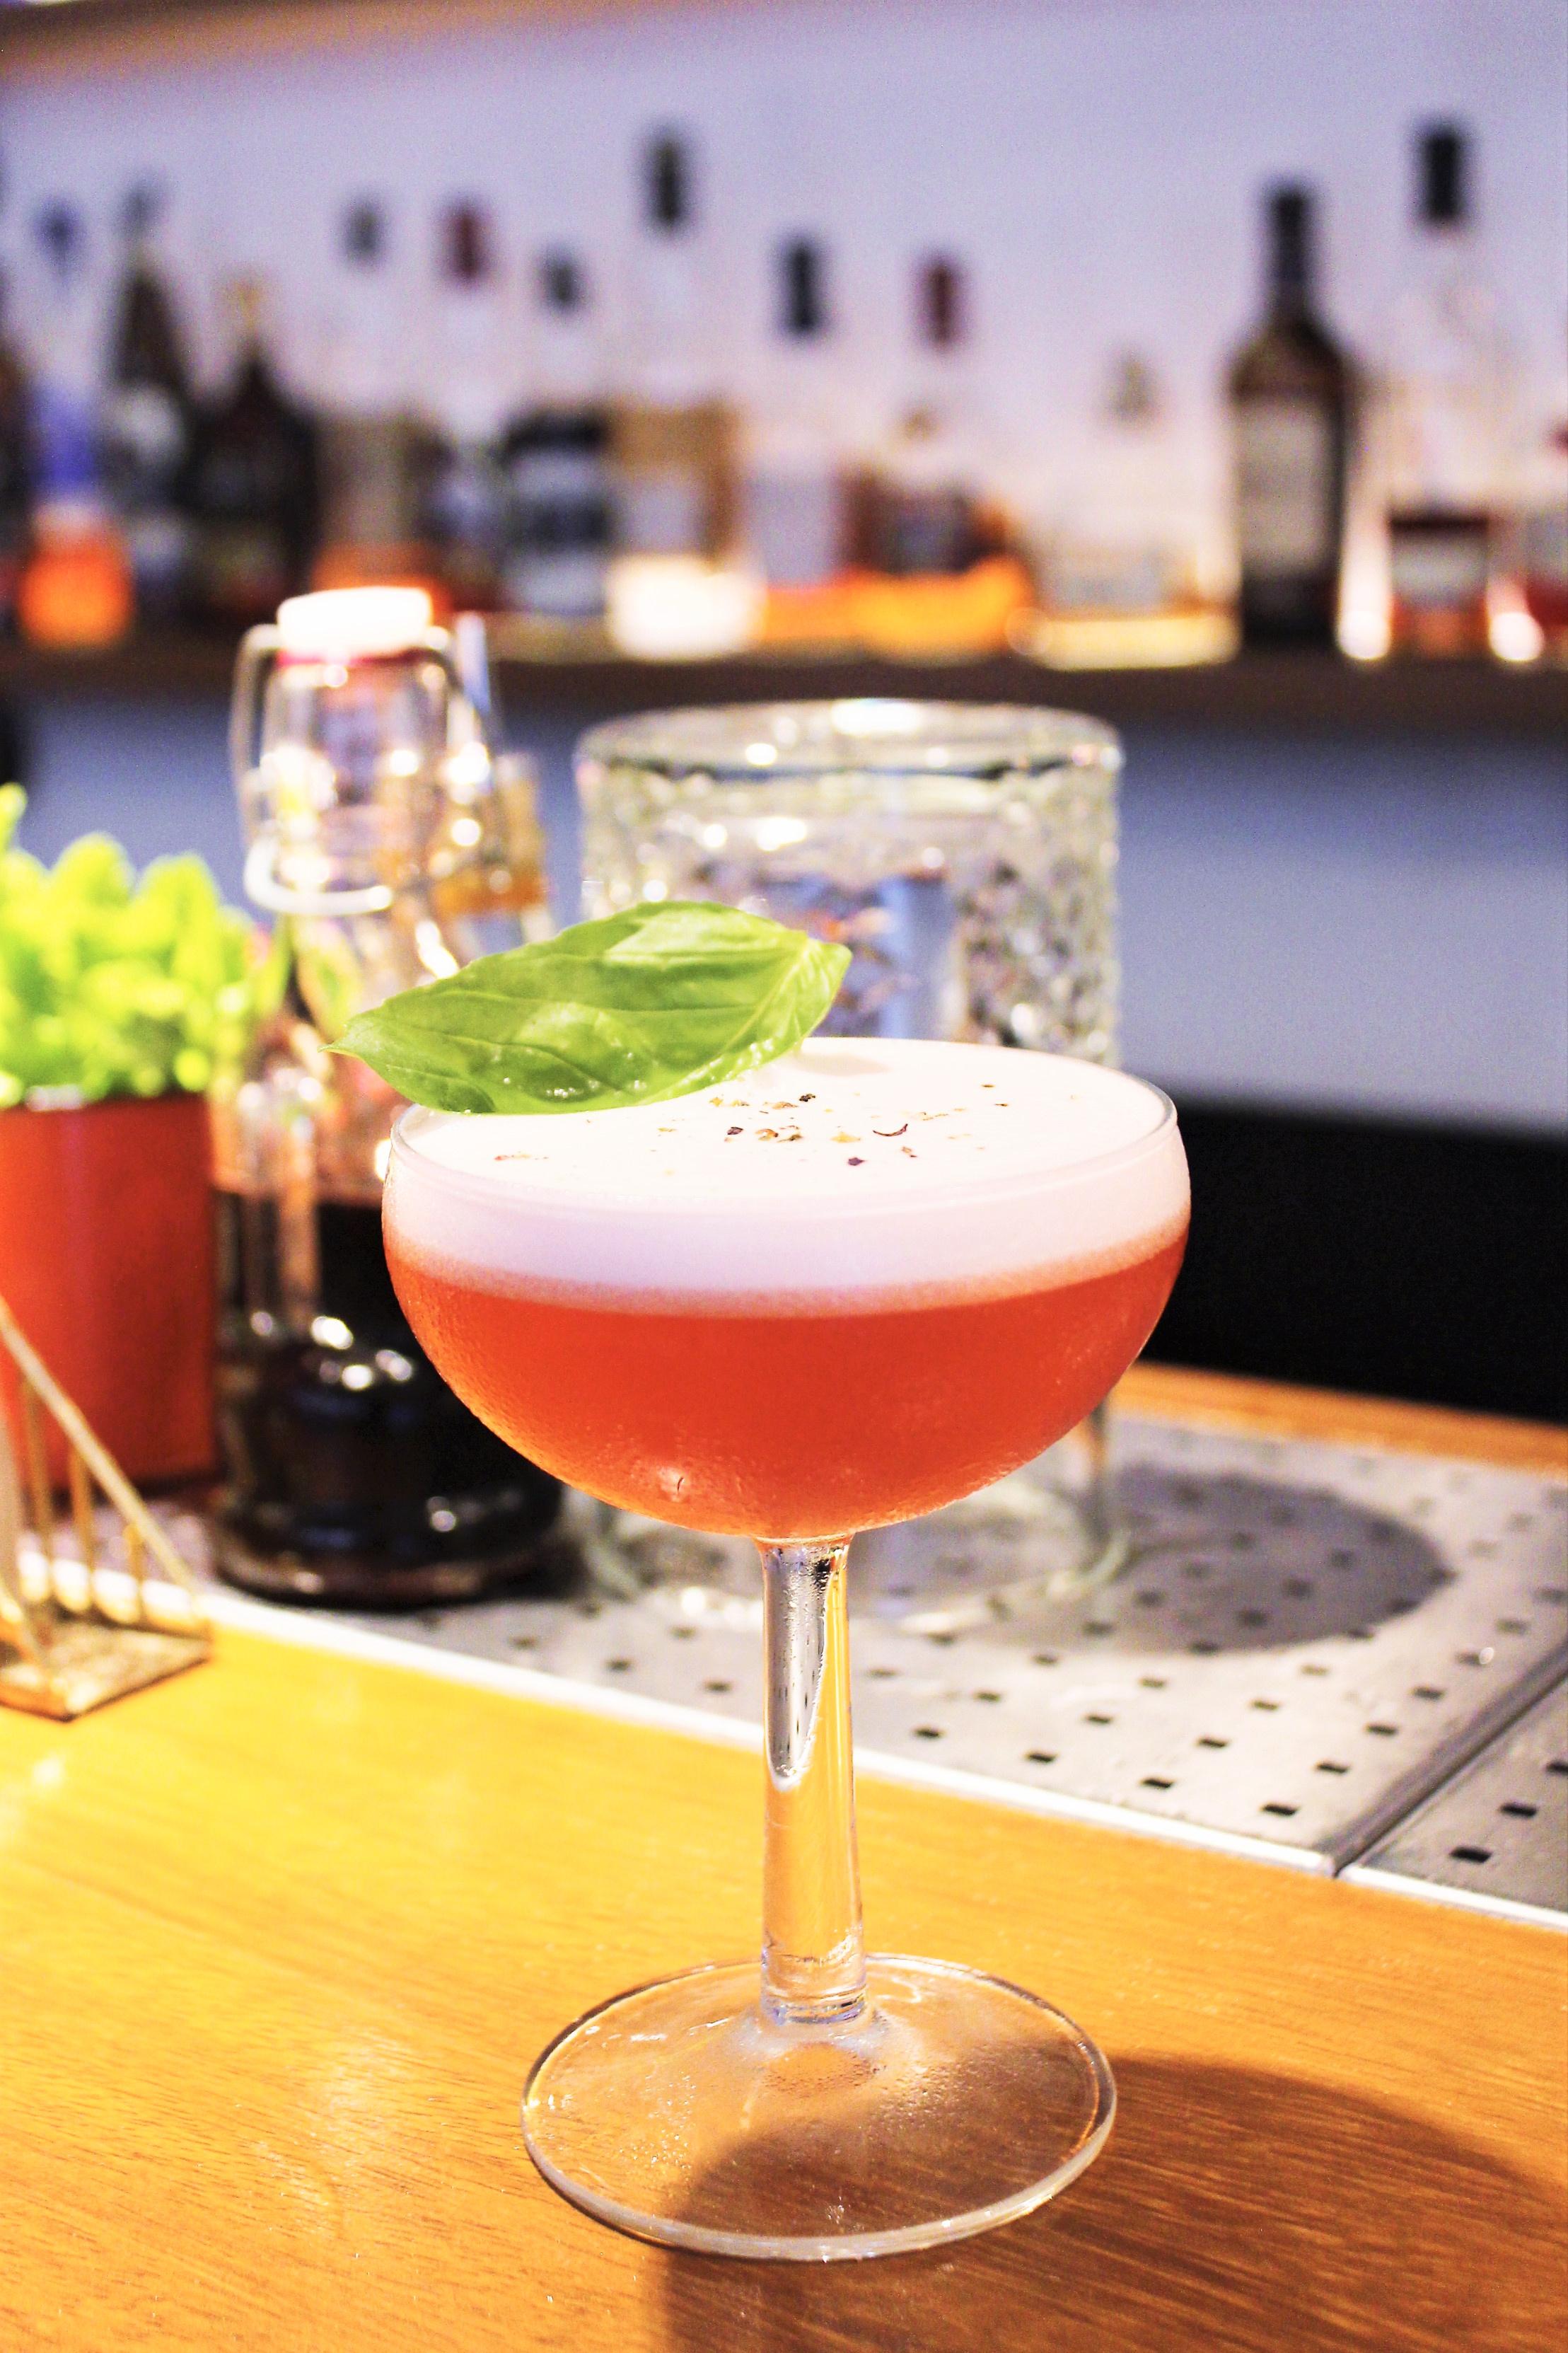 Basil Club Cocktail: Gin, Sour Raspberries, Basil, Fresh Lemon Juice, Ground Pepper at Pax 49 in Barcelona